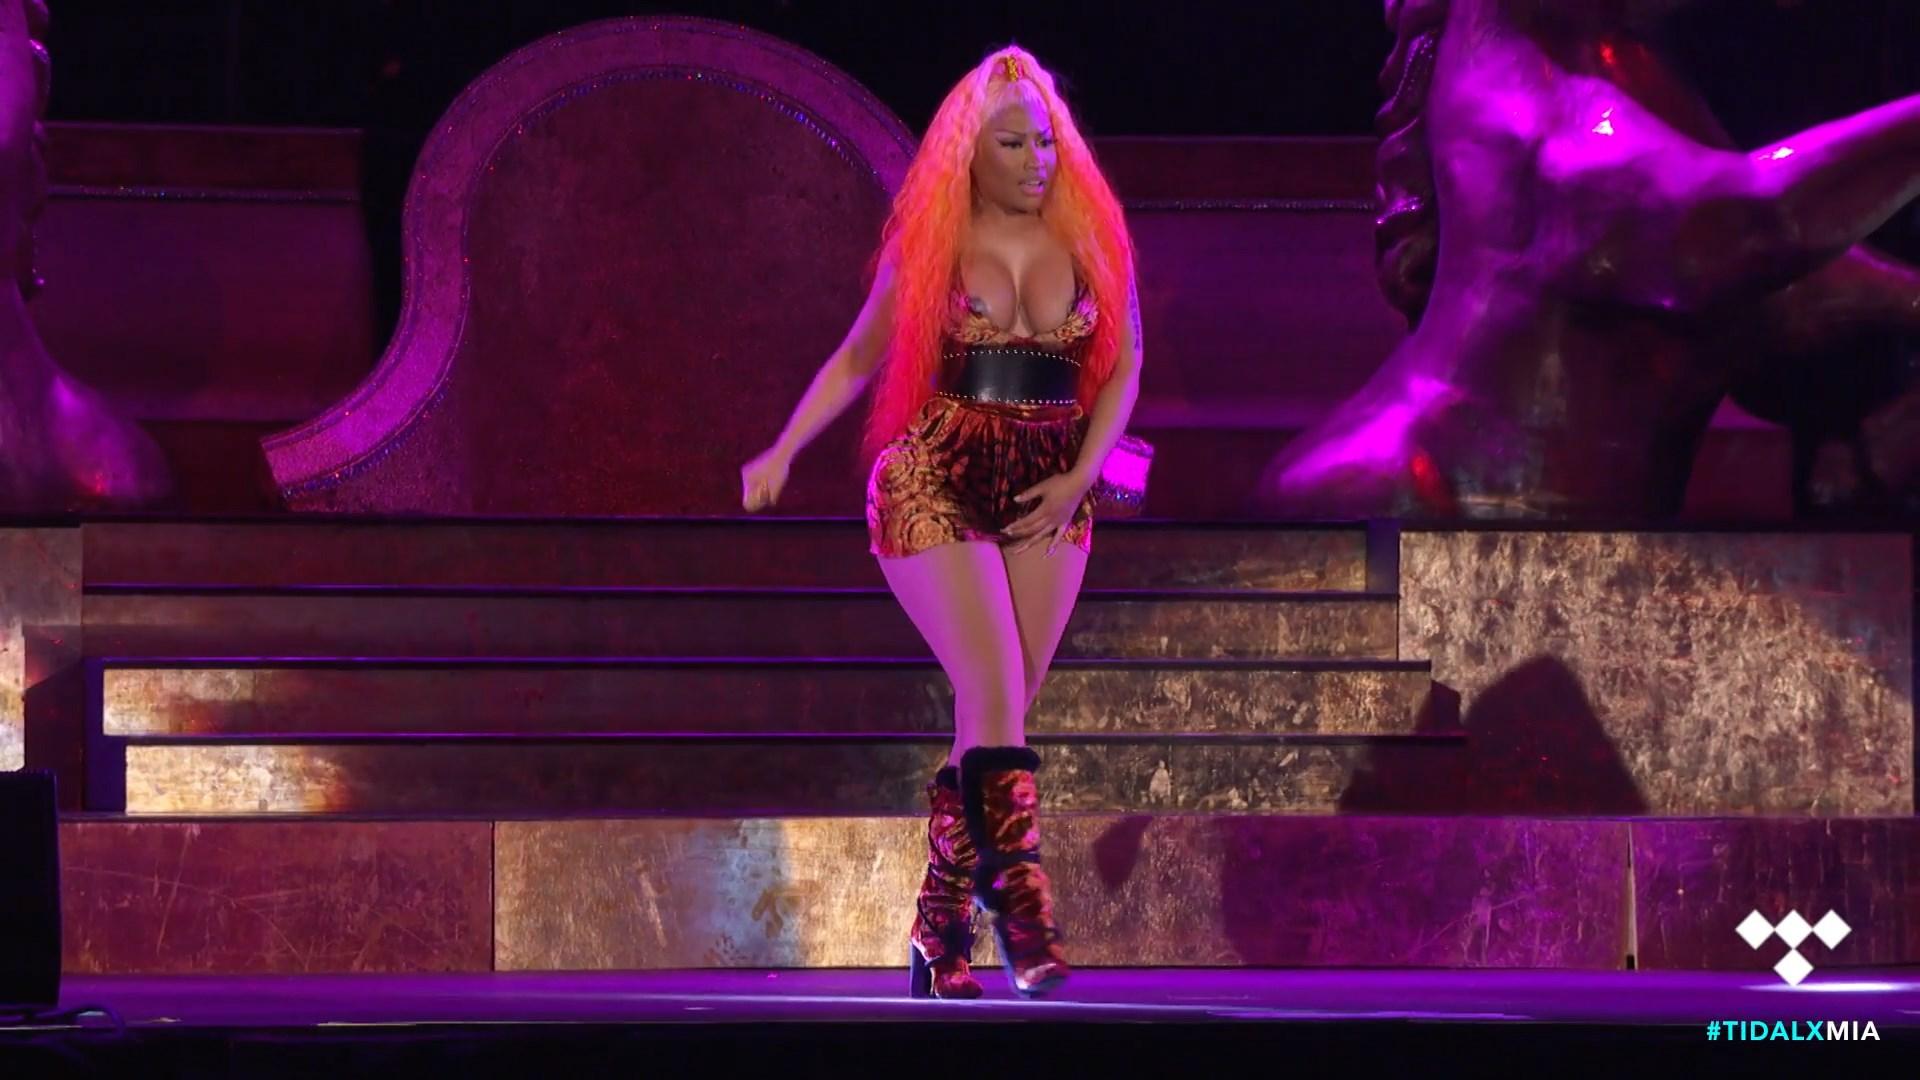 Nicki-Minaj-Nude-TheFappeningBlog.com-11.jpg